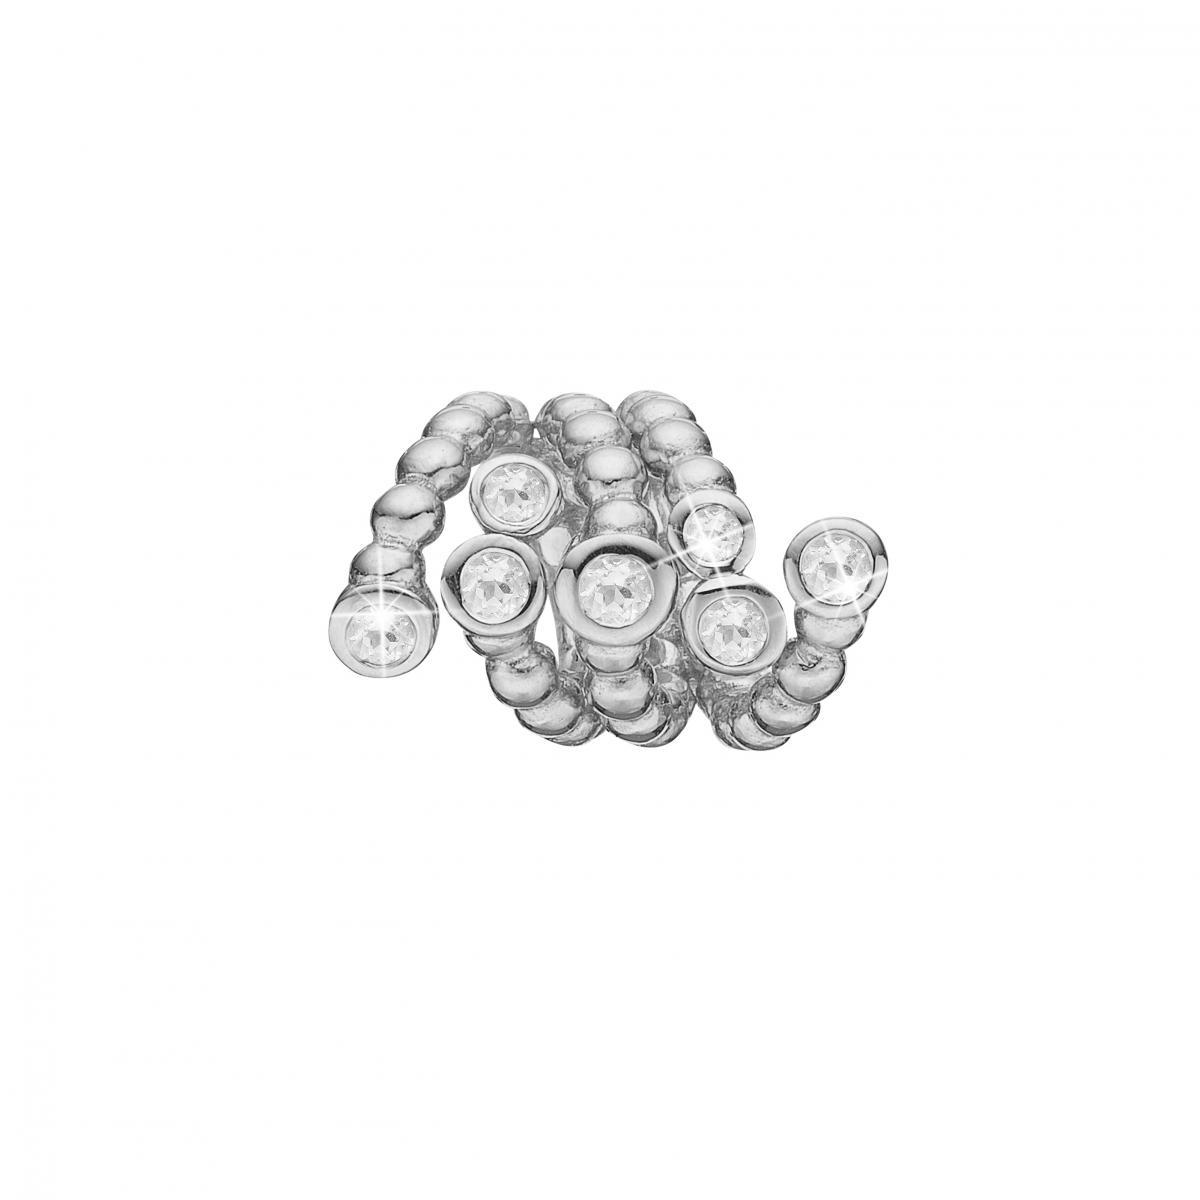 Christina galaxies sølv charm - 630-S96